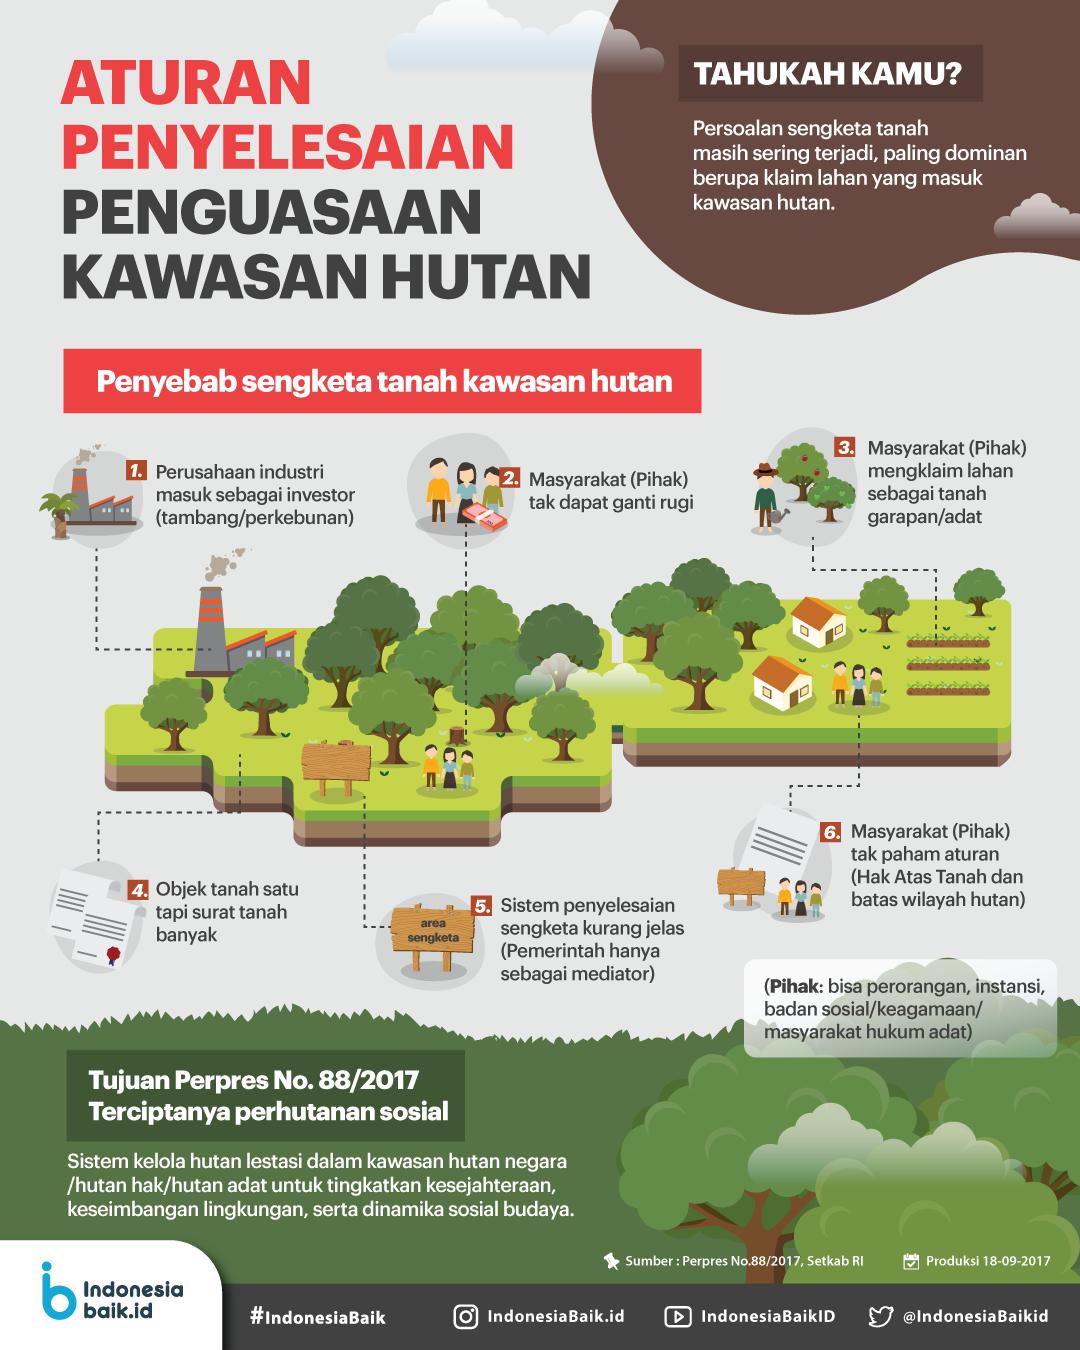 Aturan Penyelesaian Penguasaan Kawasan Hutan